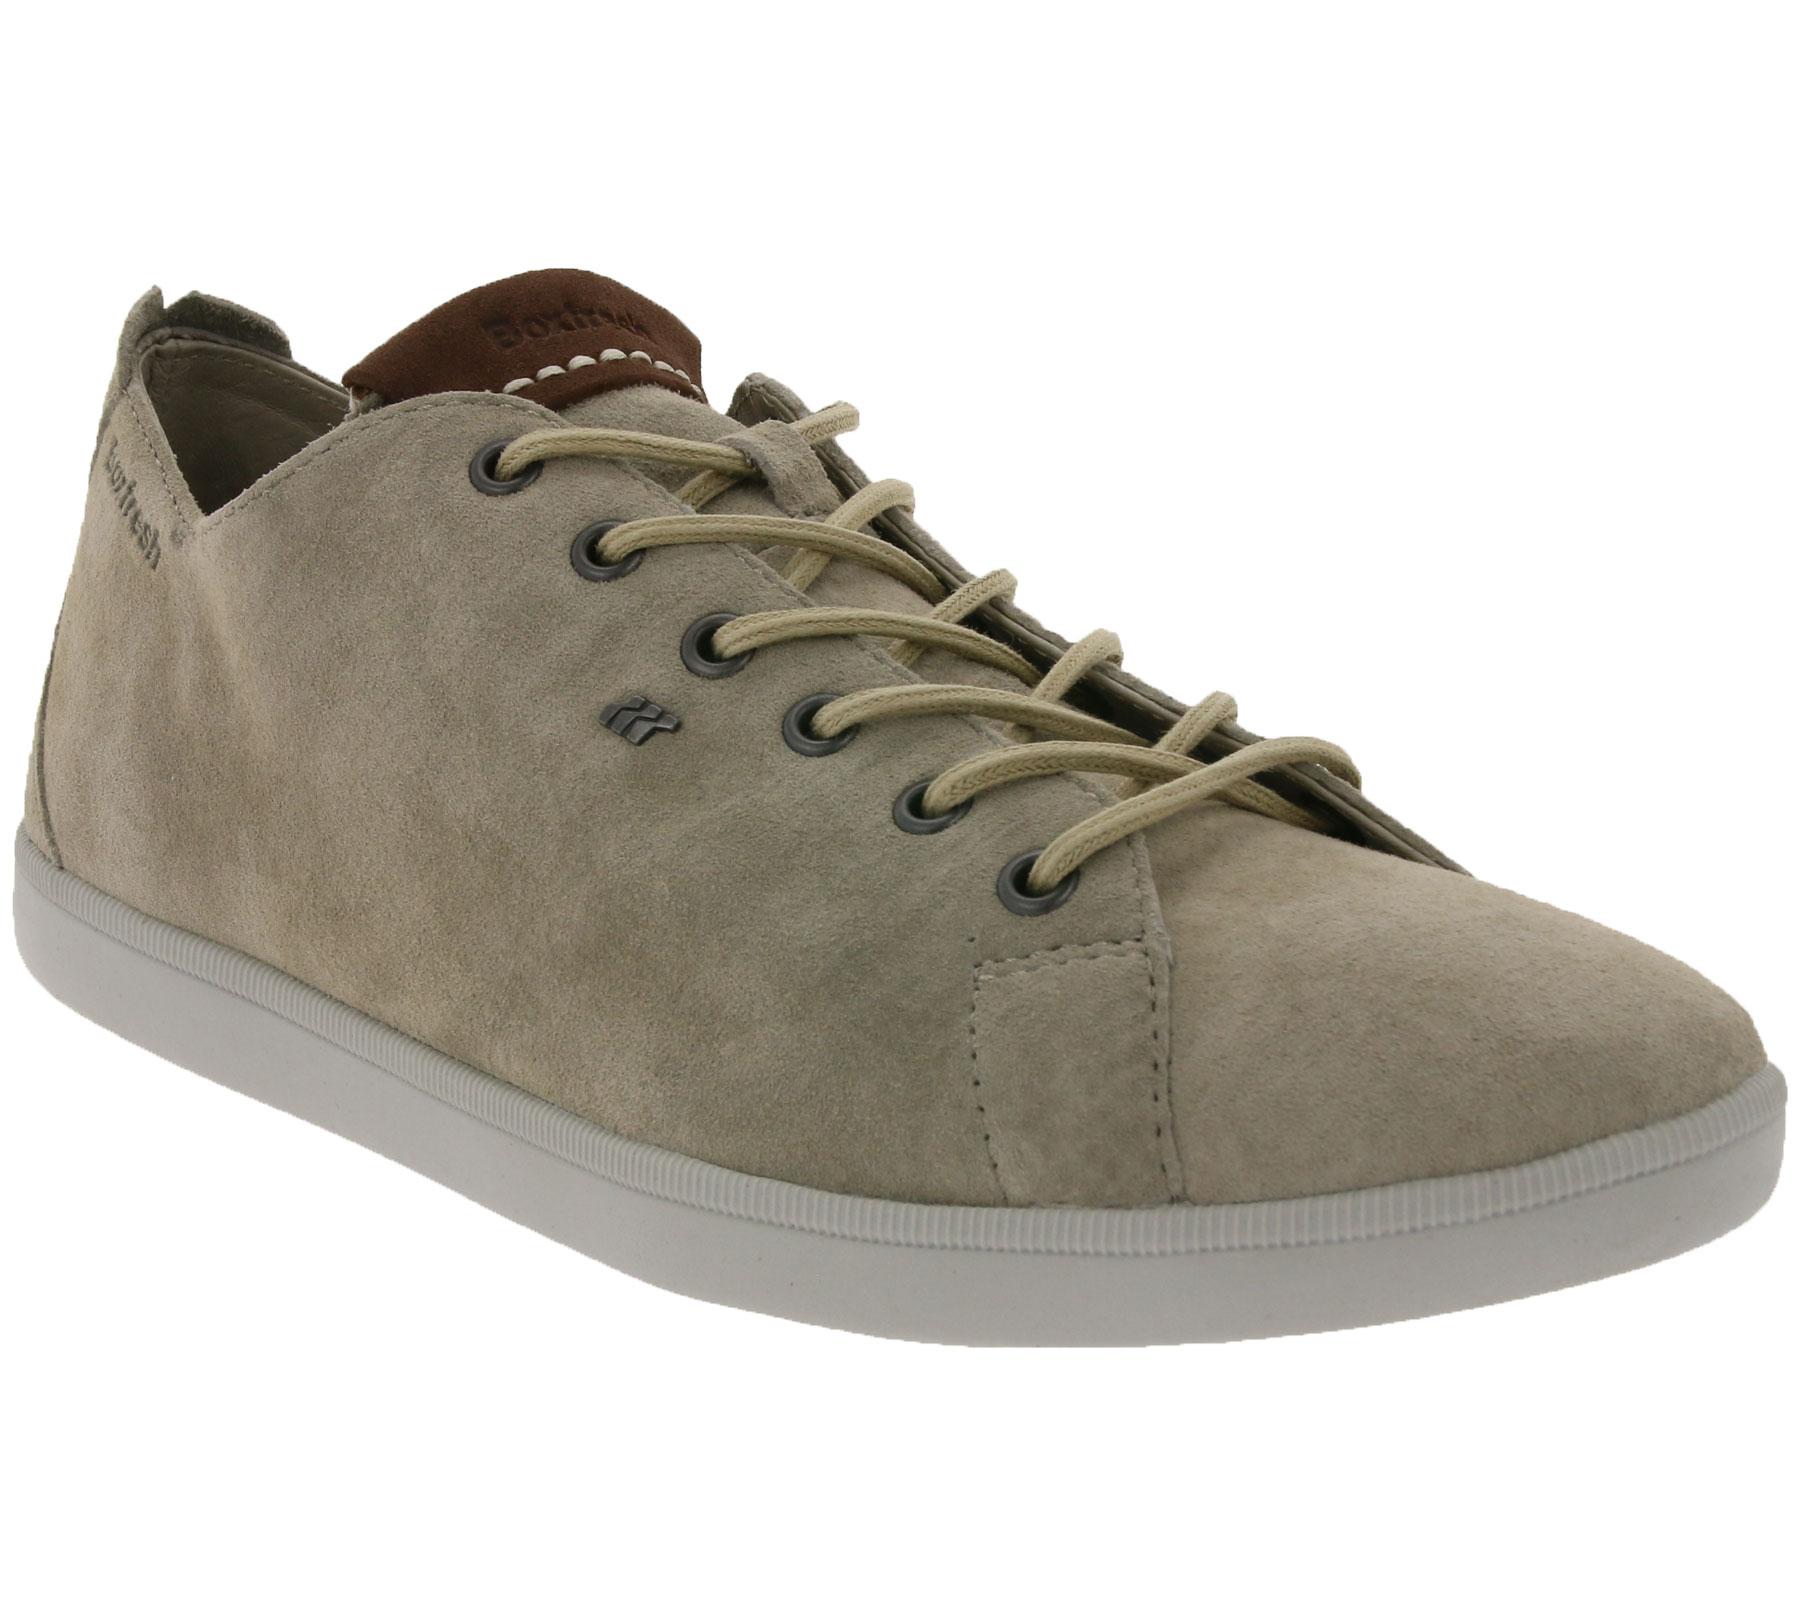 Großer Boxfresh Sneaker Sale z.B. Echtleder Sneaker Lanpar + Gratis Jogginghose & Lieferung!